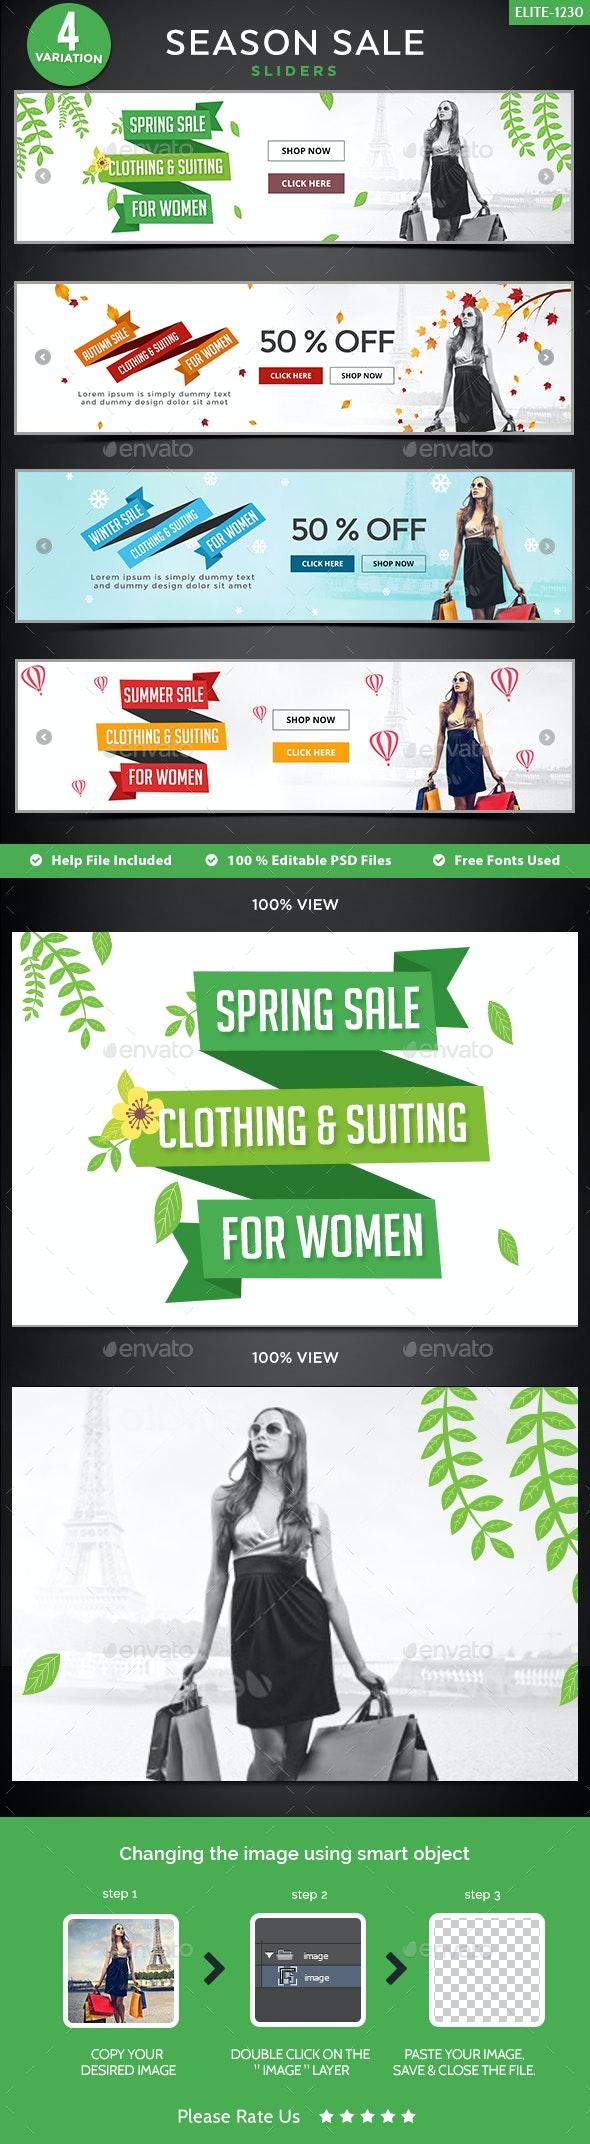 Season Sale Sliders - 4 Colors - Sliders & Features Web Elements